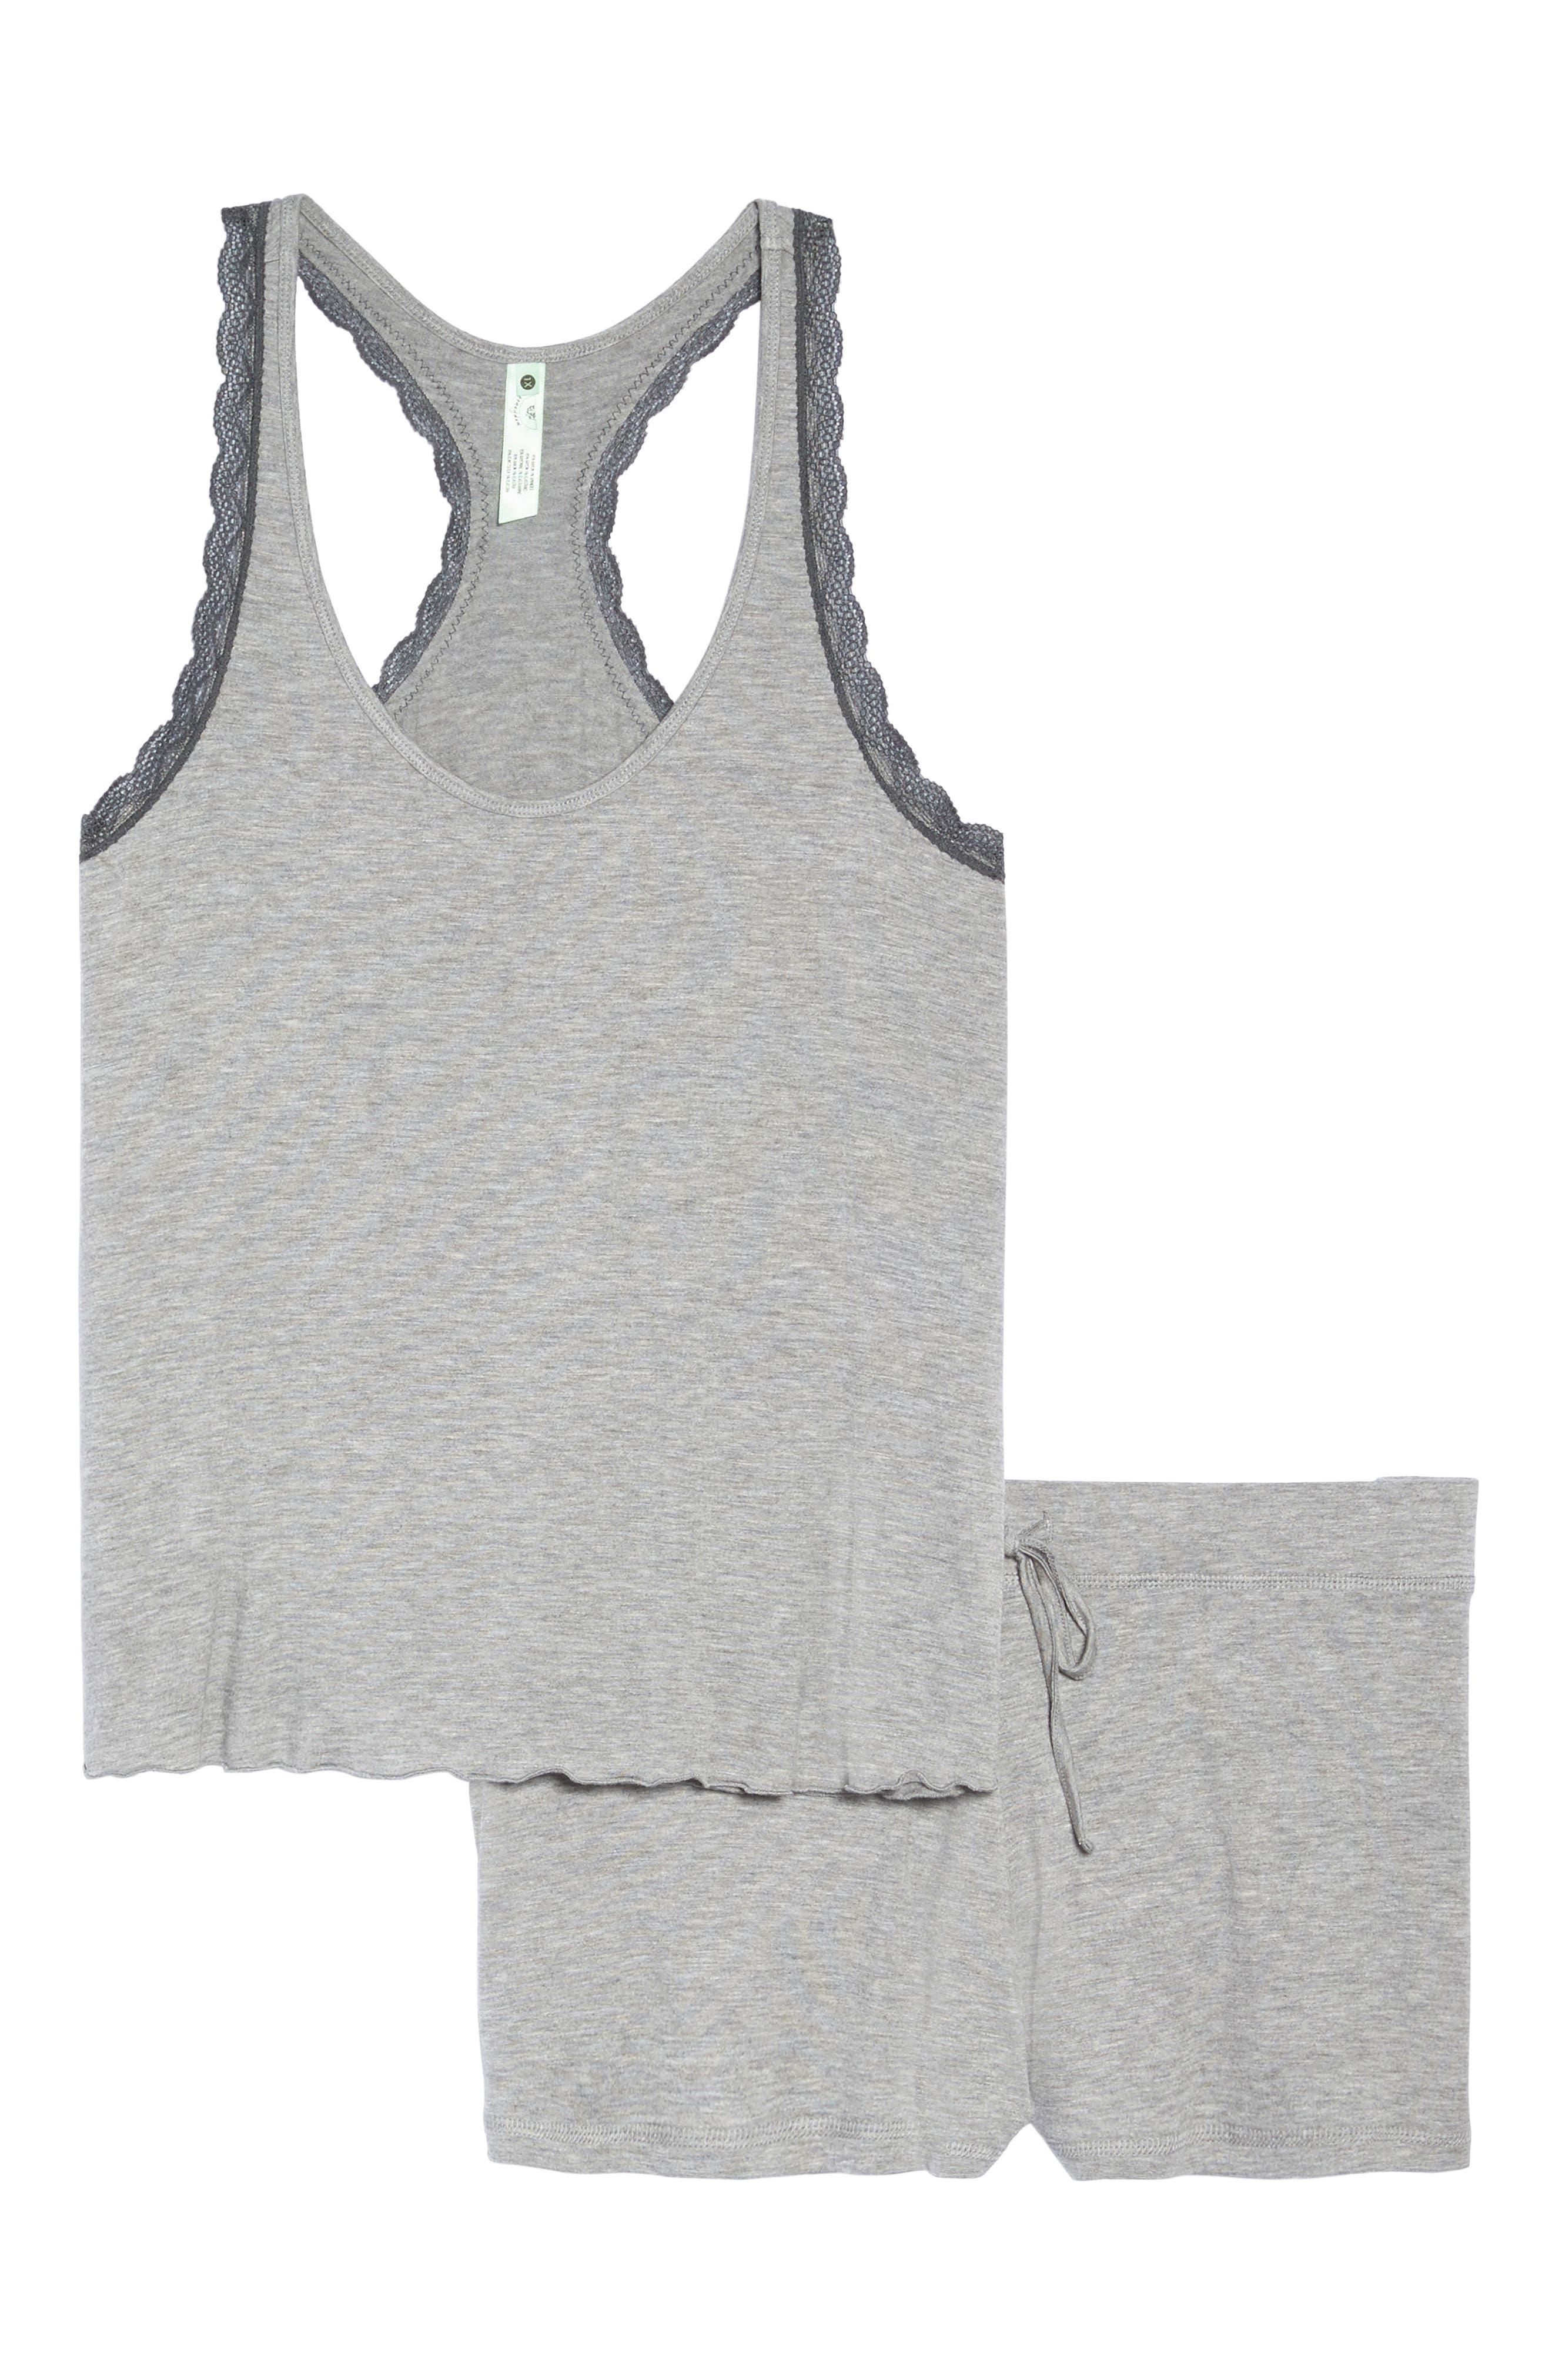 HONEYDEW INTIMATES,                             All American Shortie Pajamas,                             Alternate thumbnail 6, color,                             HEATHER GREY